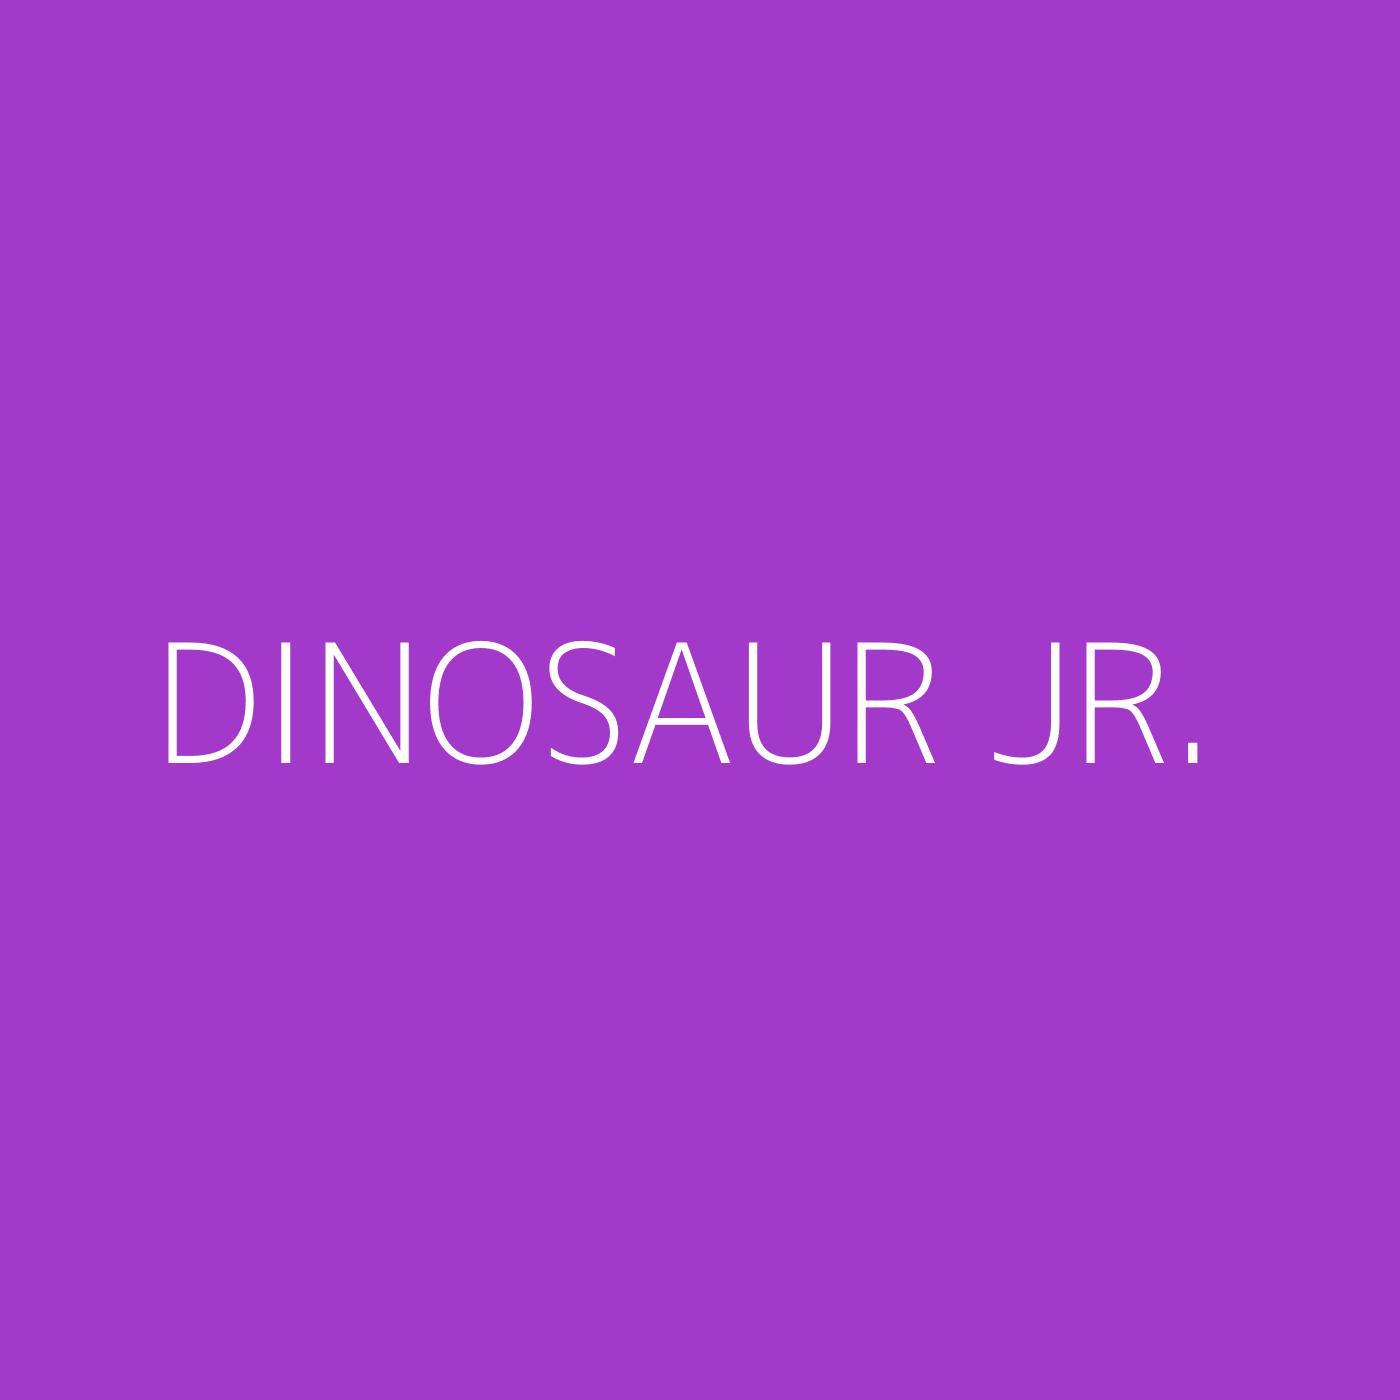 Dinosaur Jr. Playlist Artwork